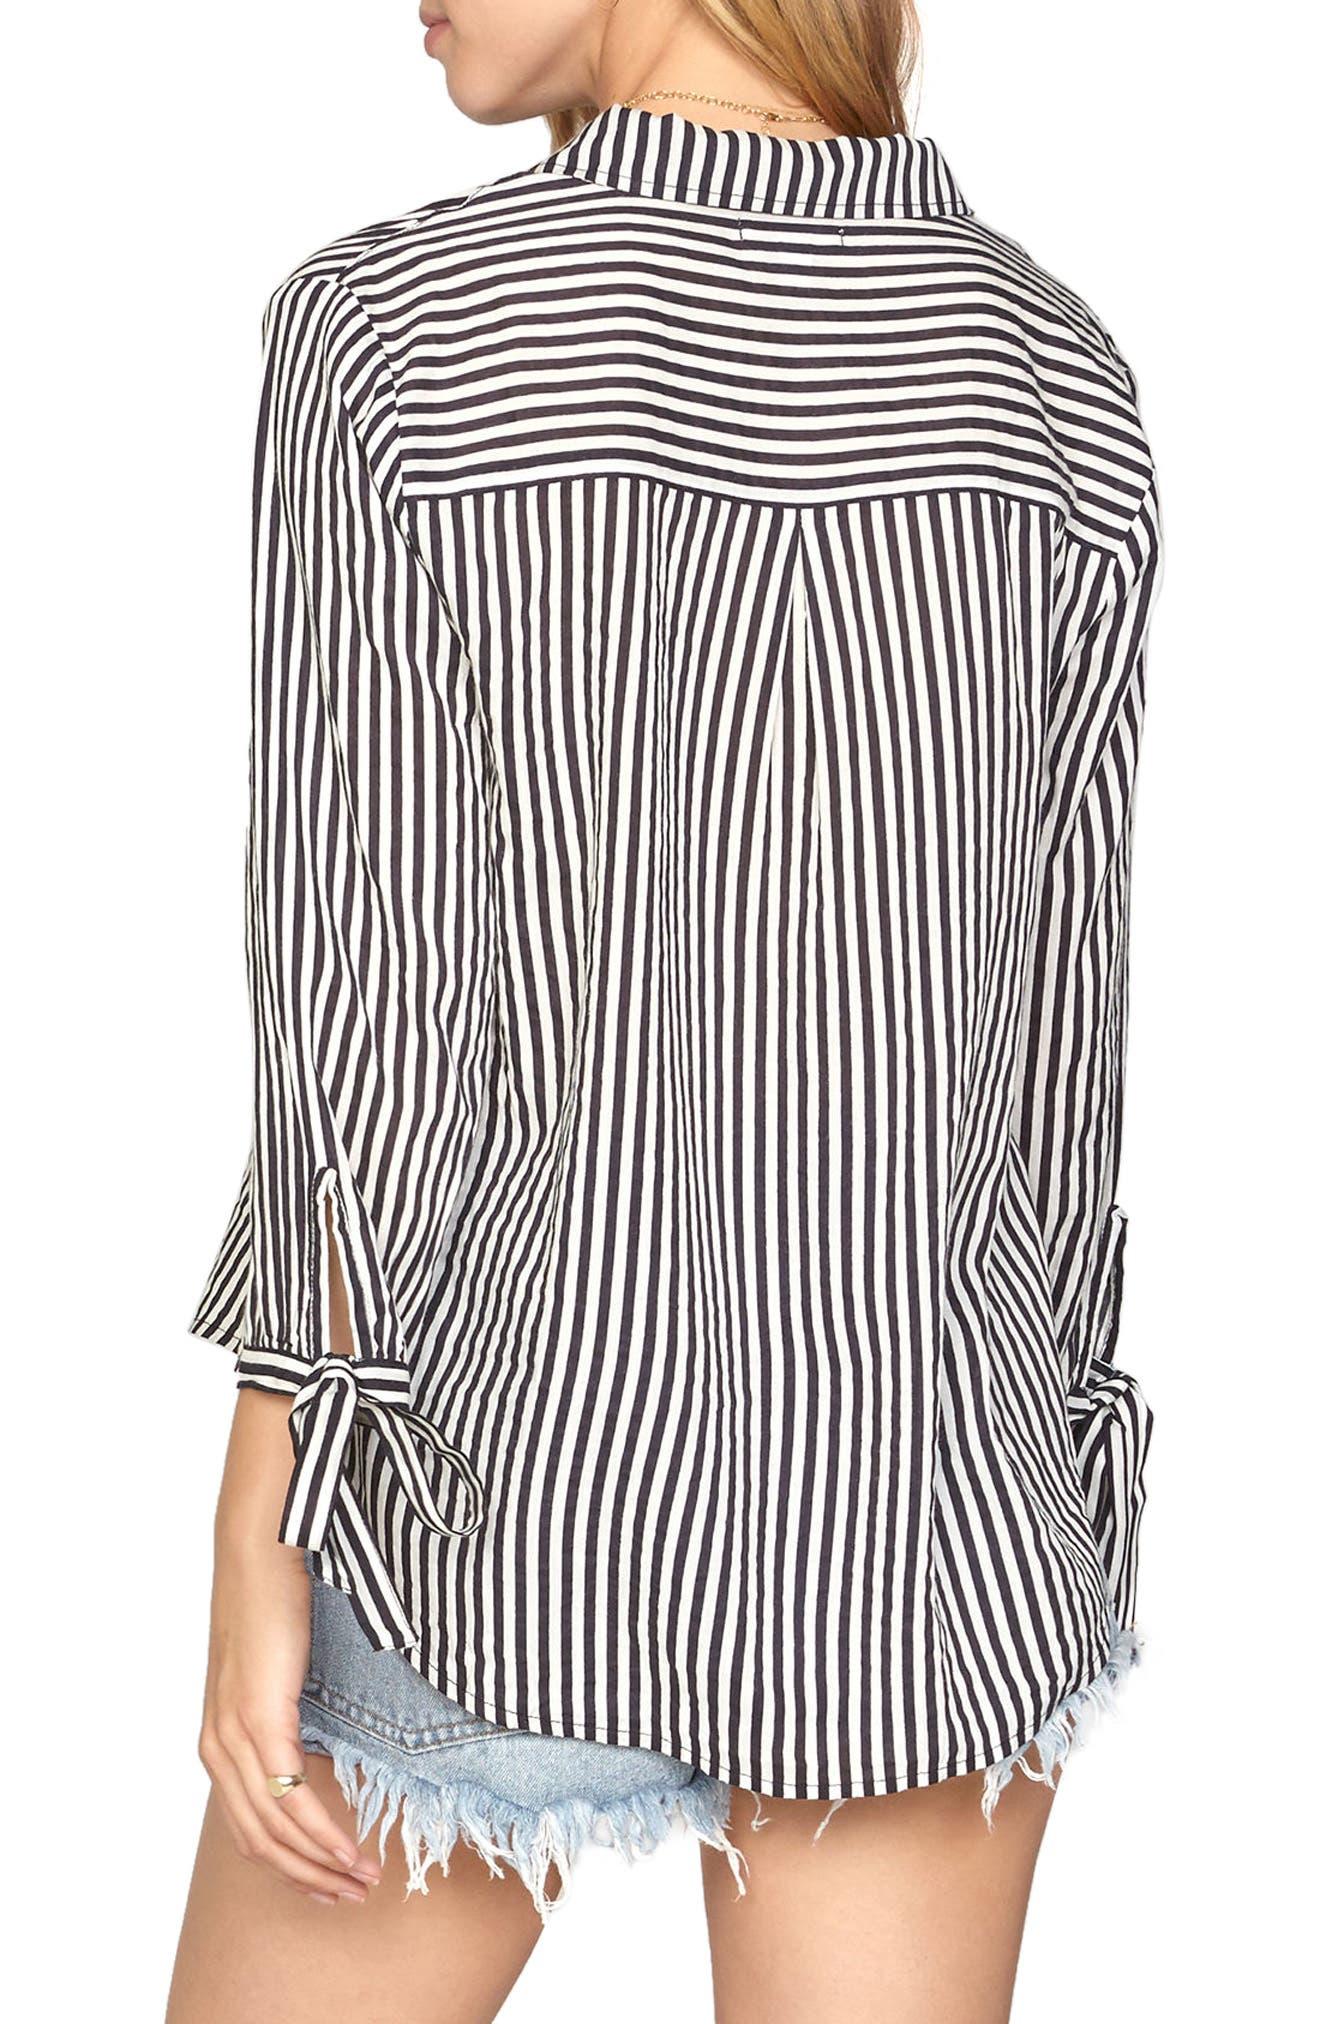 AMUSE SOCIETY,                             Stripe Tie Cuff Shirt,                             Alternate thumbnail 2, color,                             001